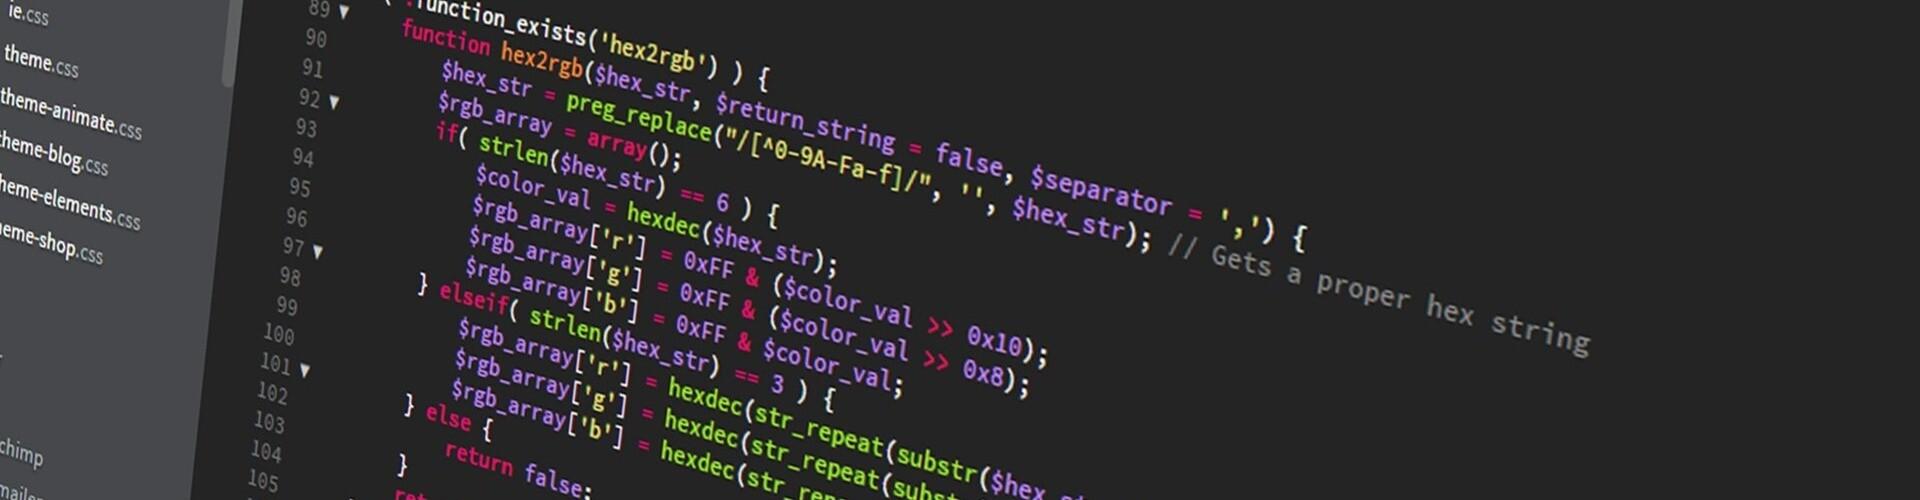 Development and crypto news